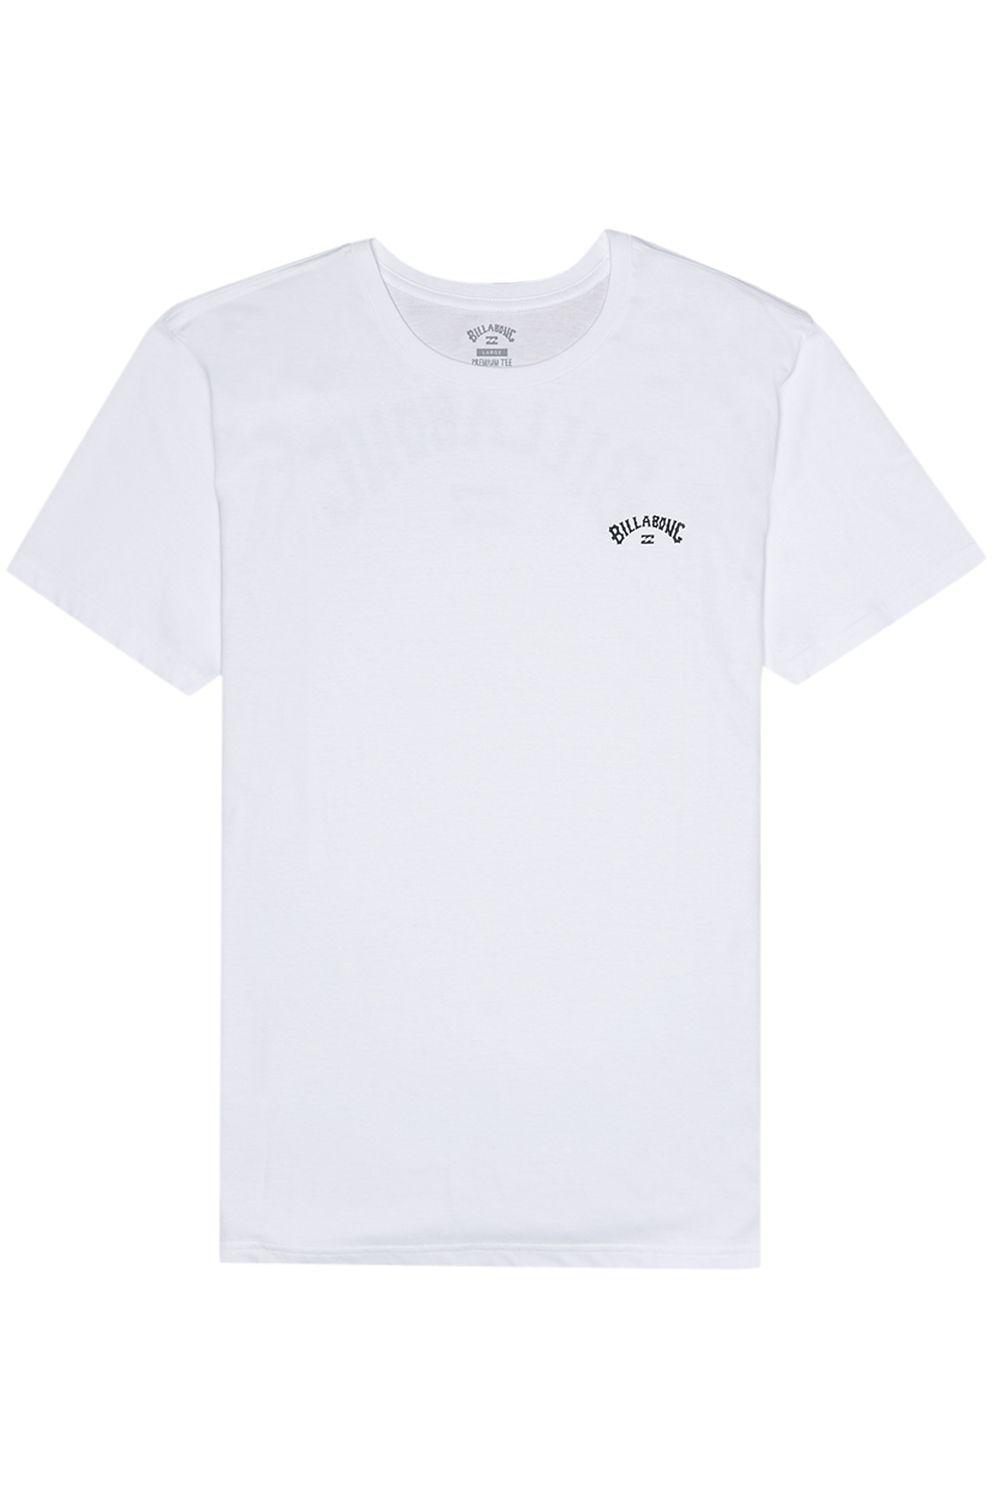 T-Shirt Billabong ARCH WAVE White